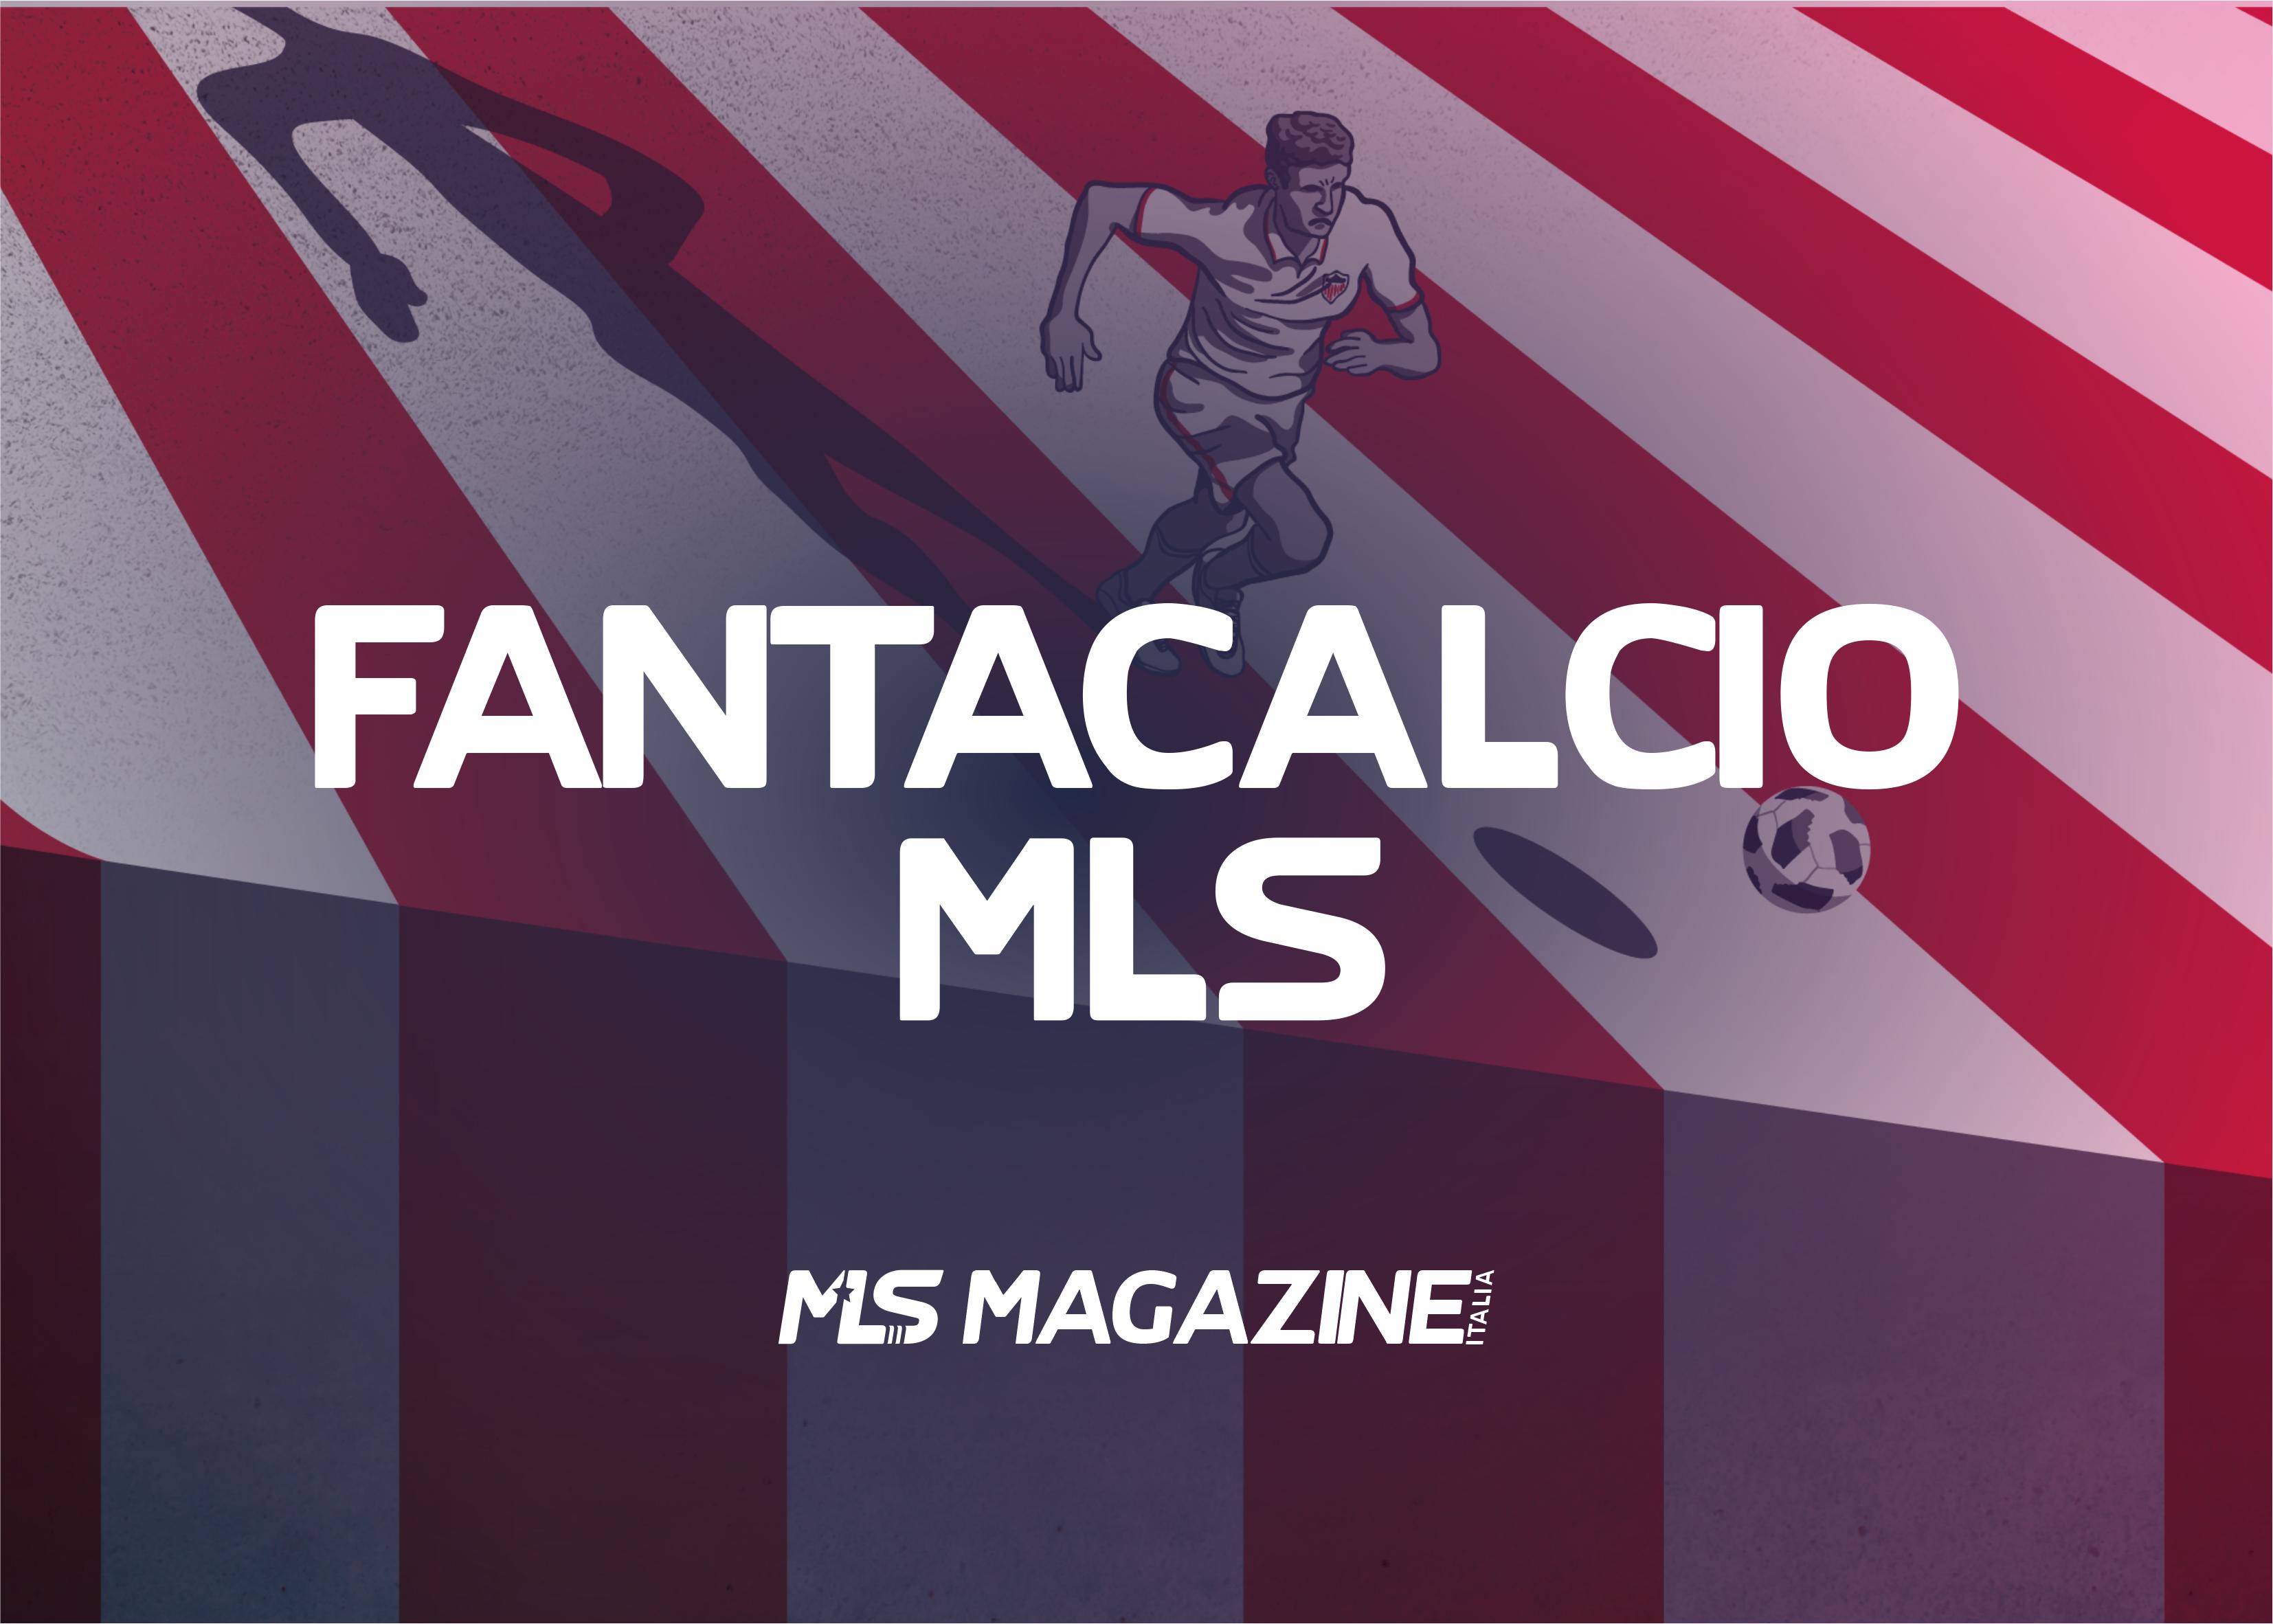 fantacalcio MLS | MLS Magazine Italia